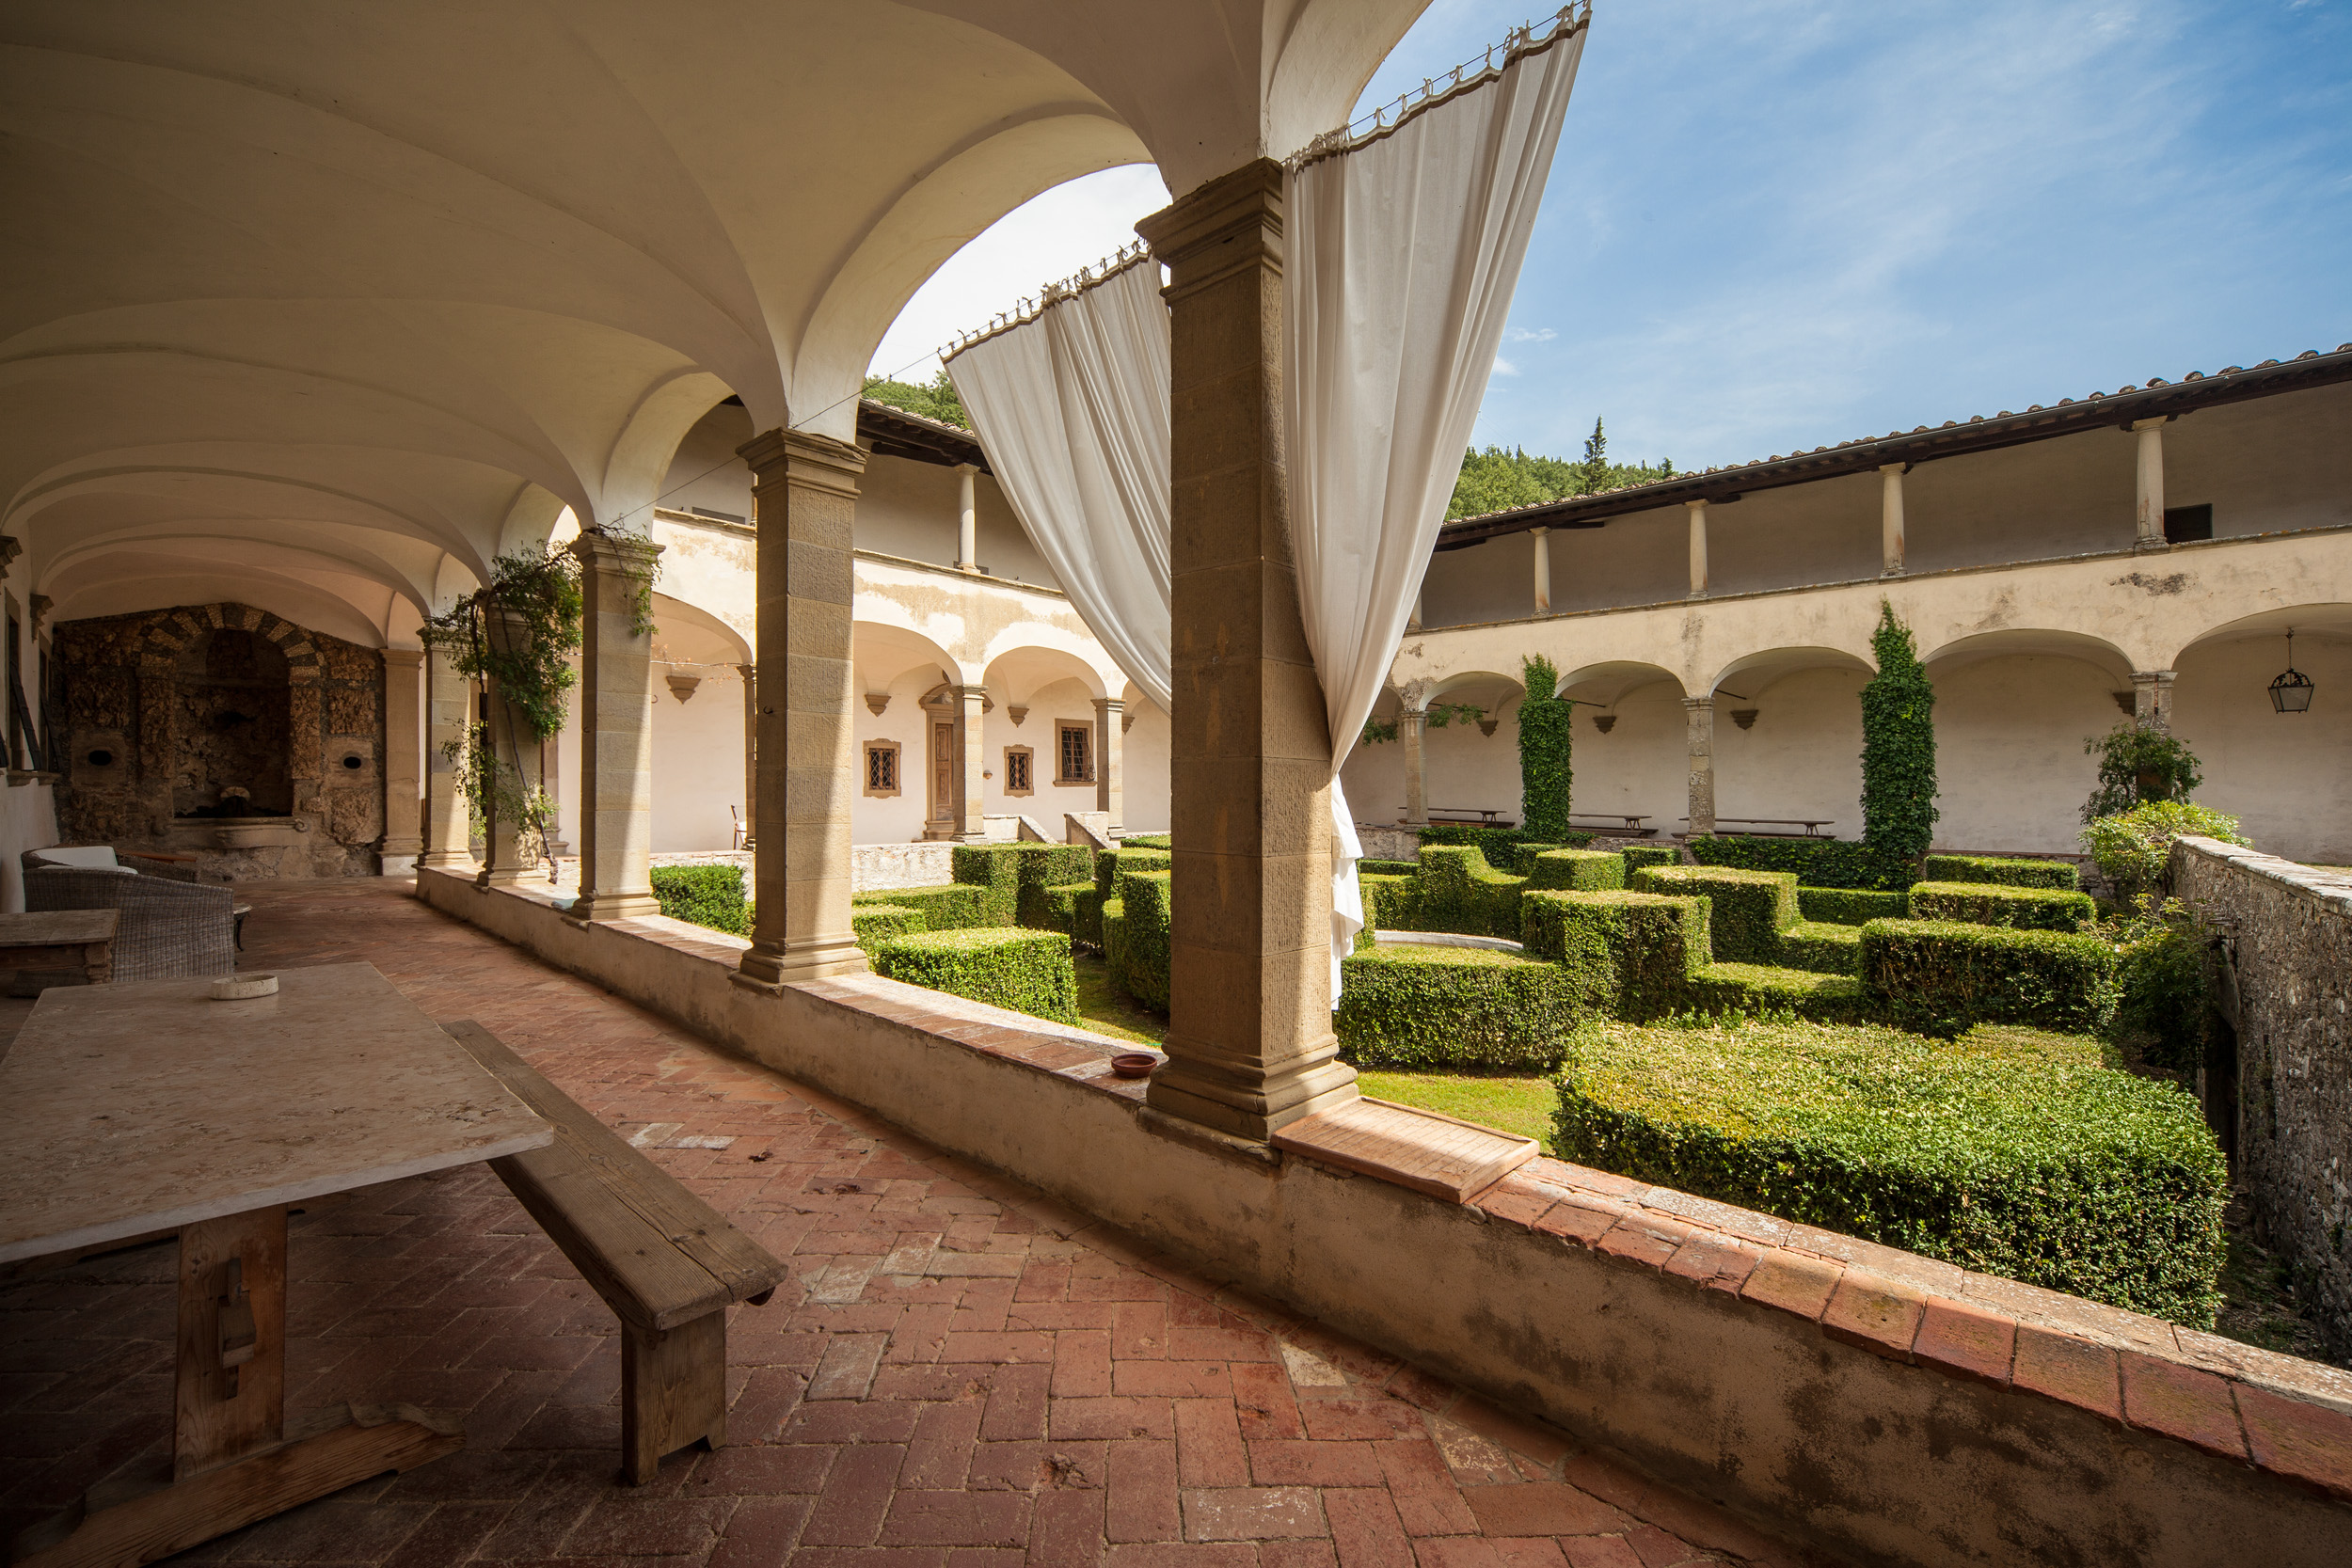 convent_villa_florence_31.jpg